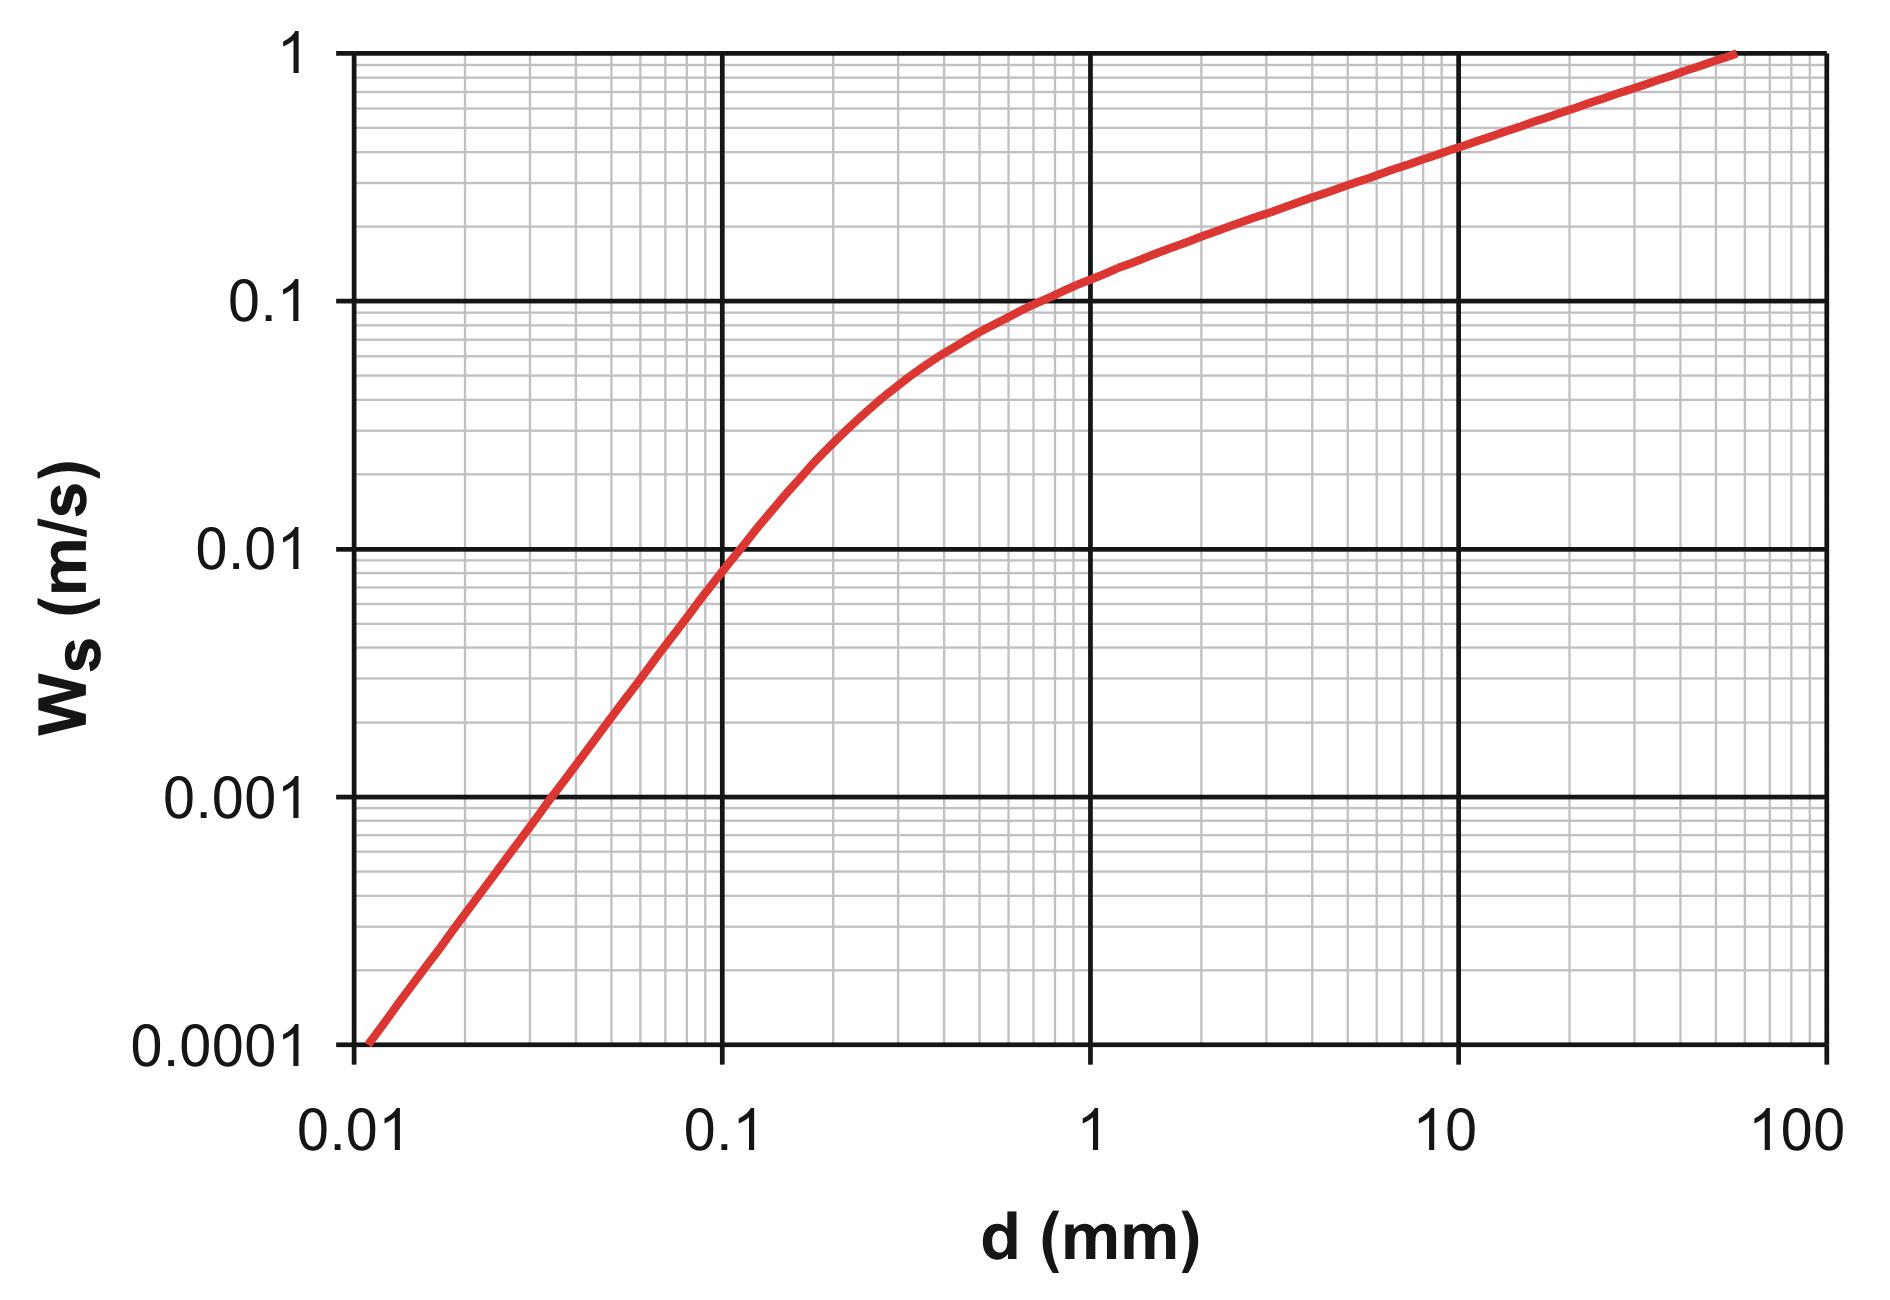 reynolds number and drag coefficient relationship help